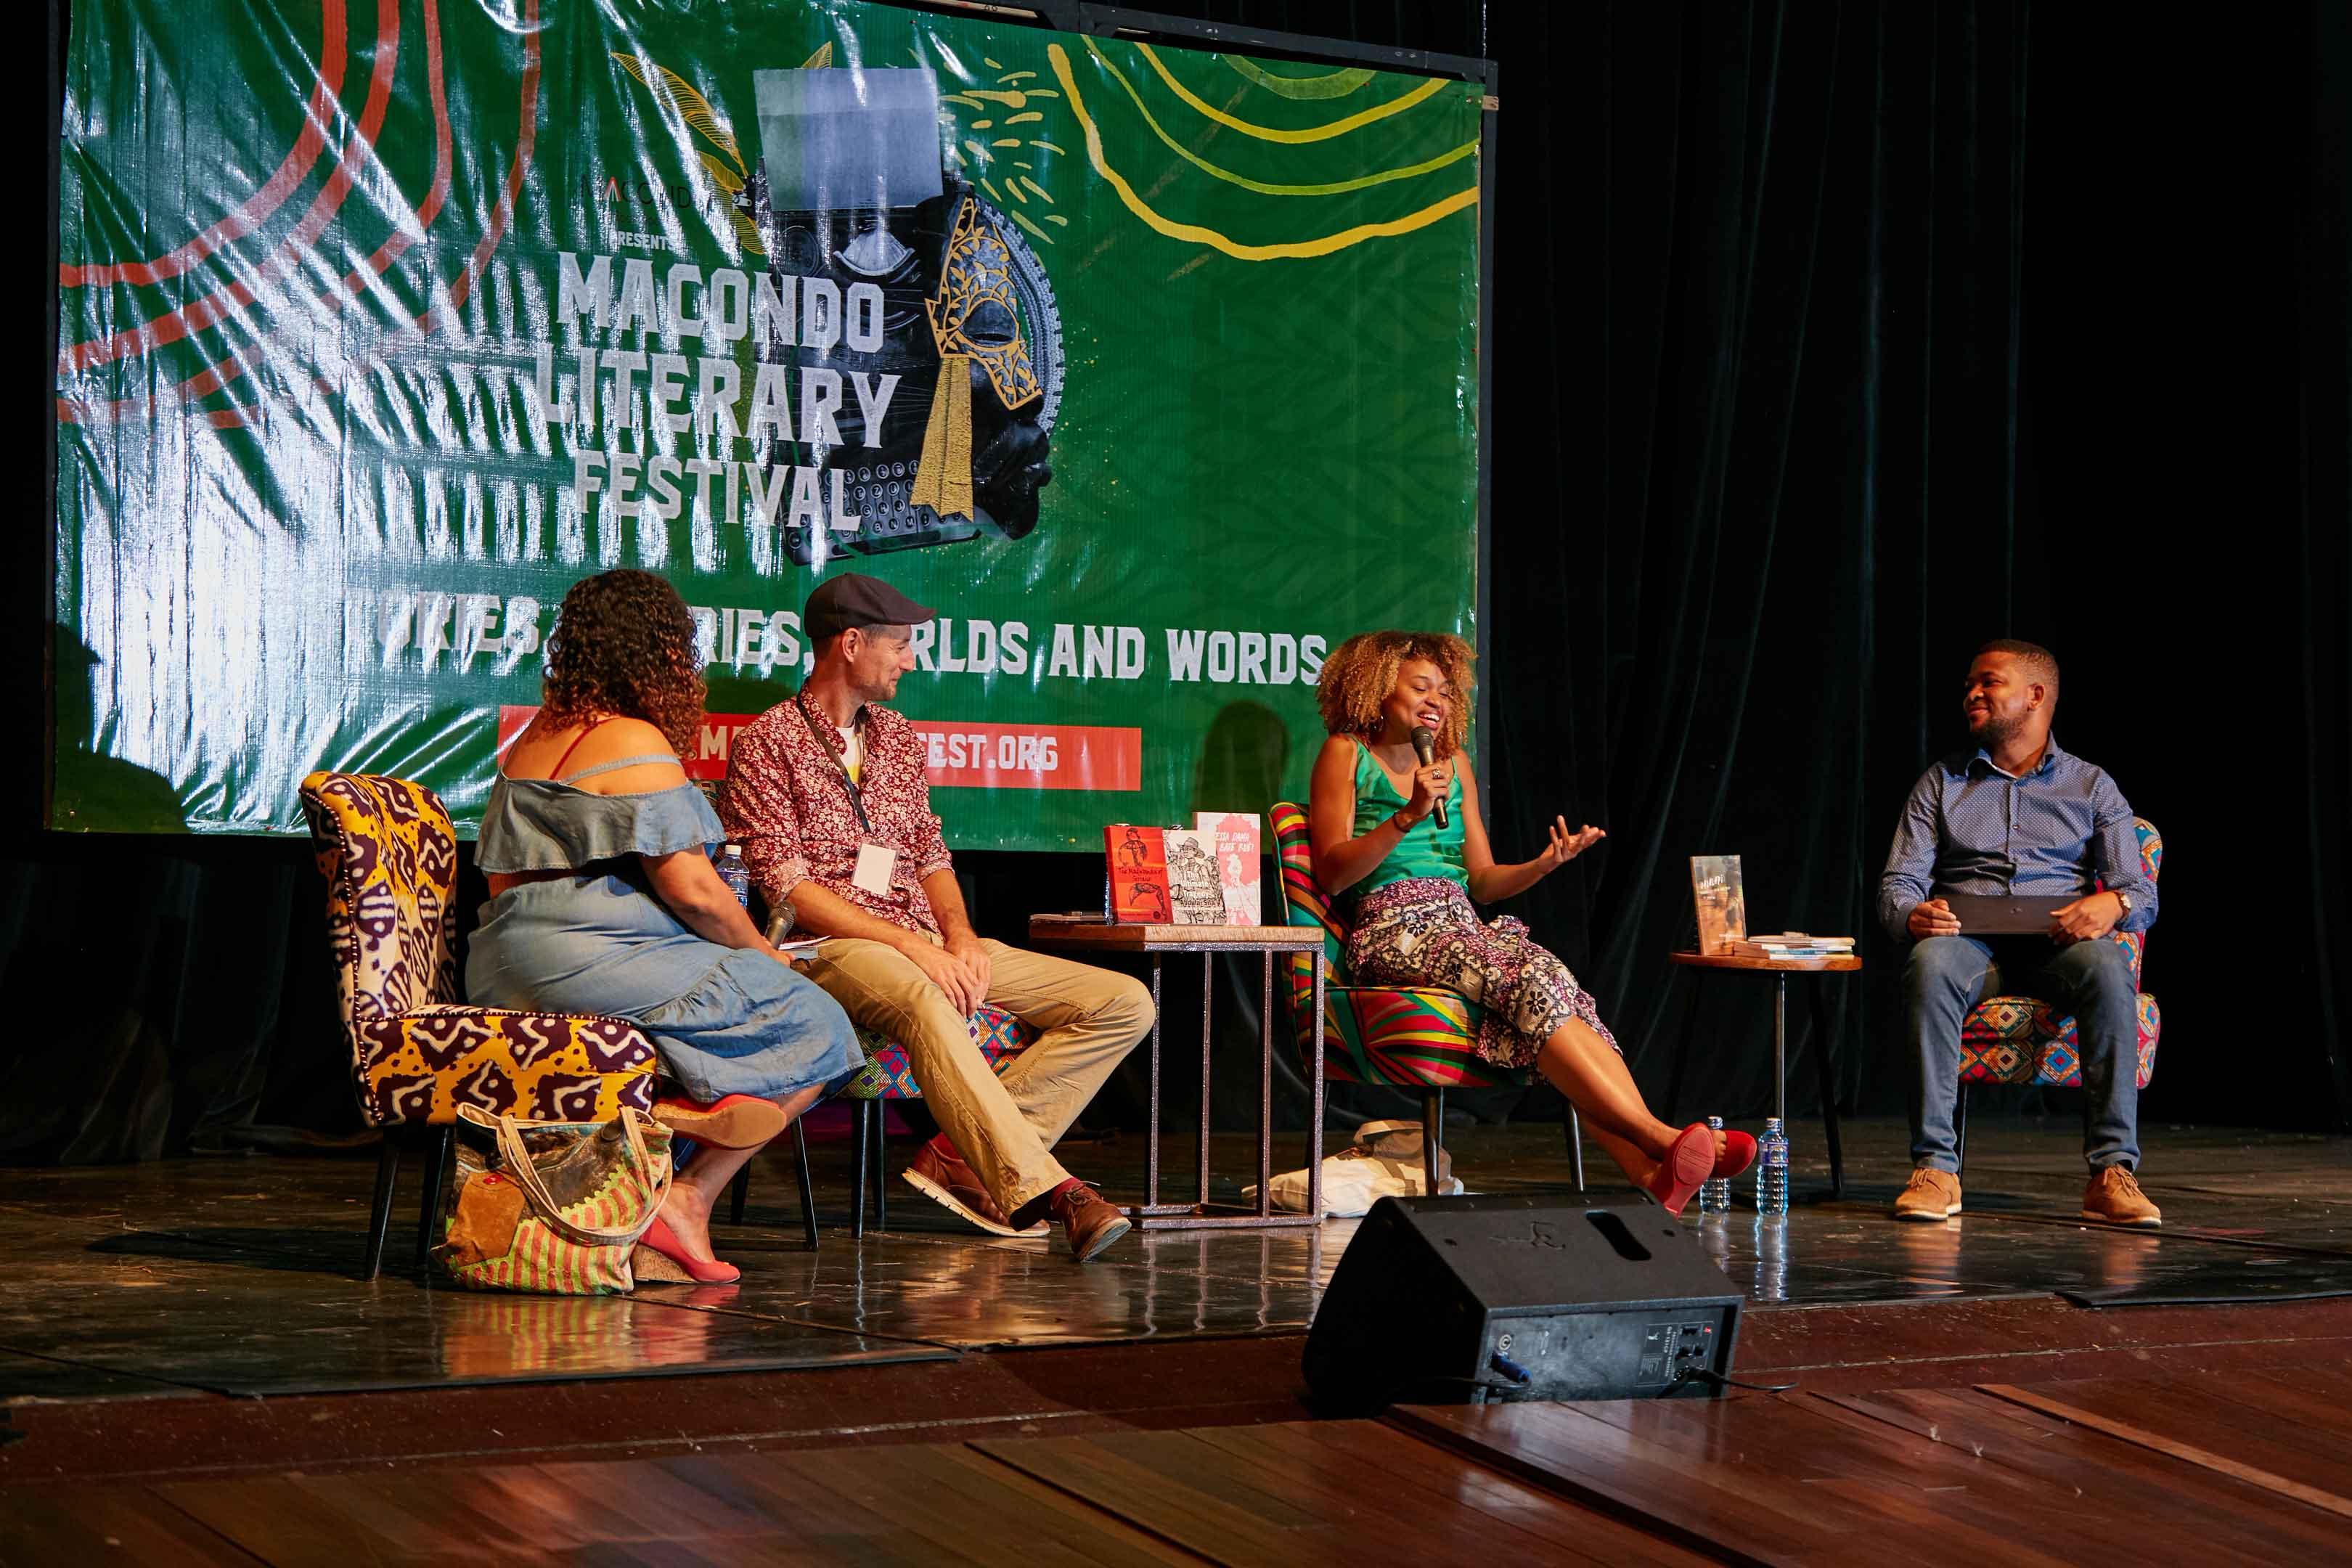 Literature_in_Lusophone_Africa_;LF19